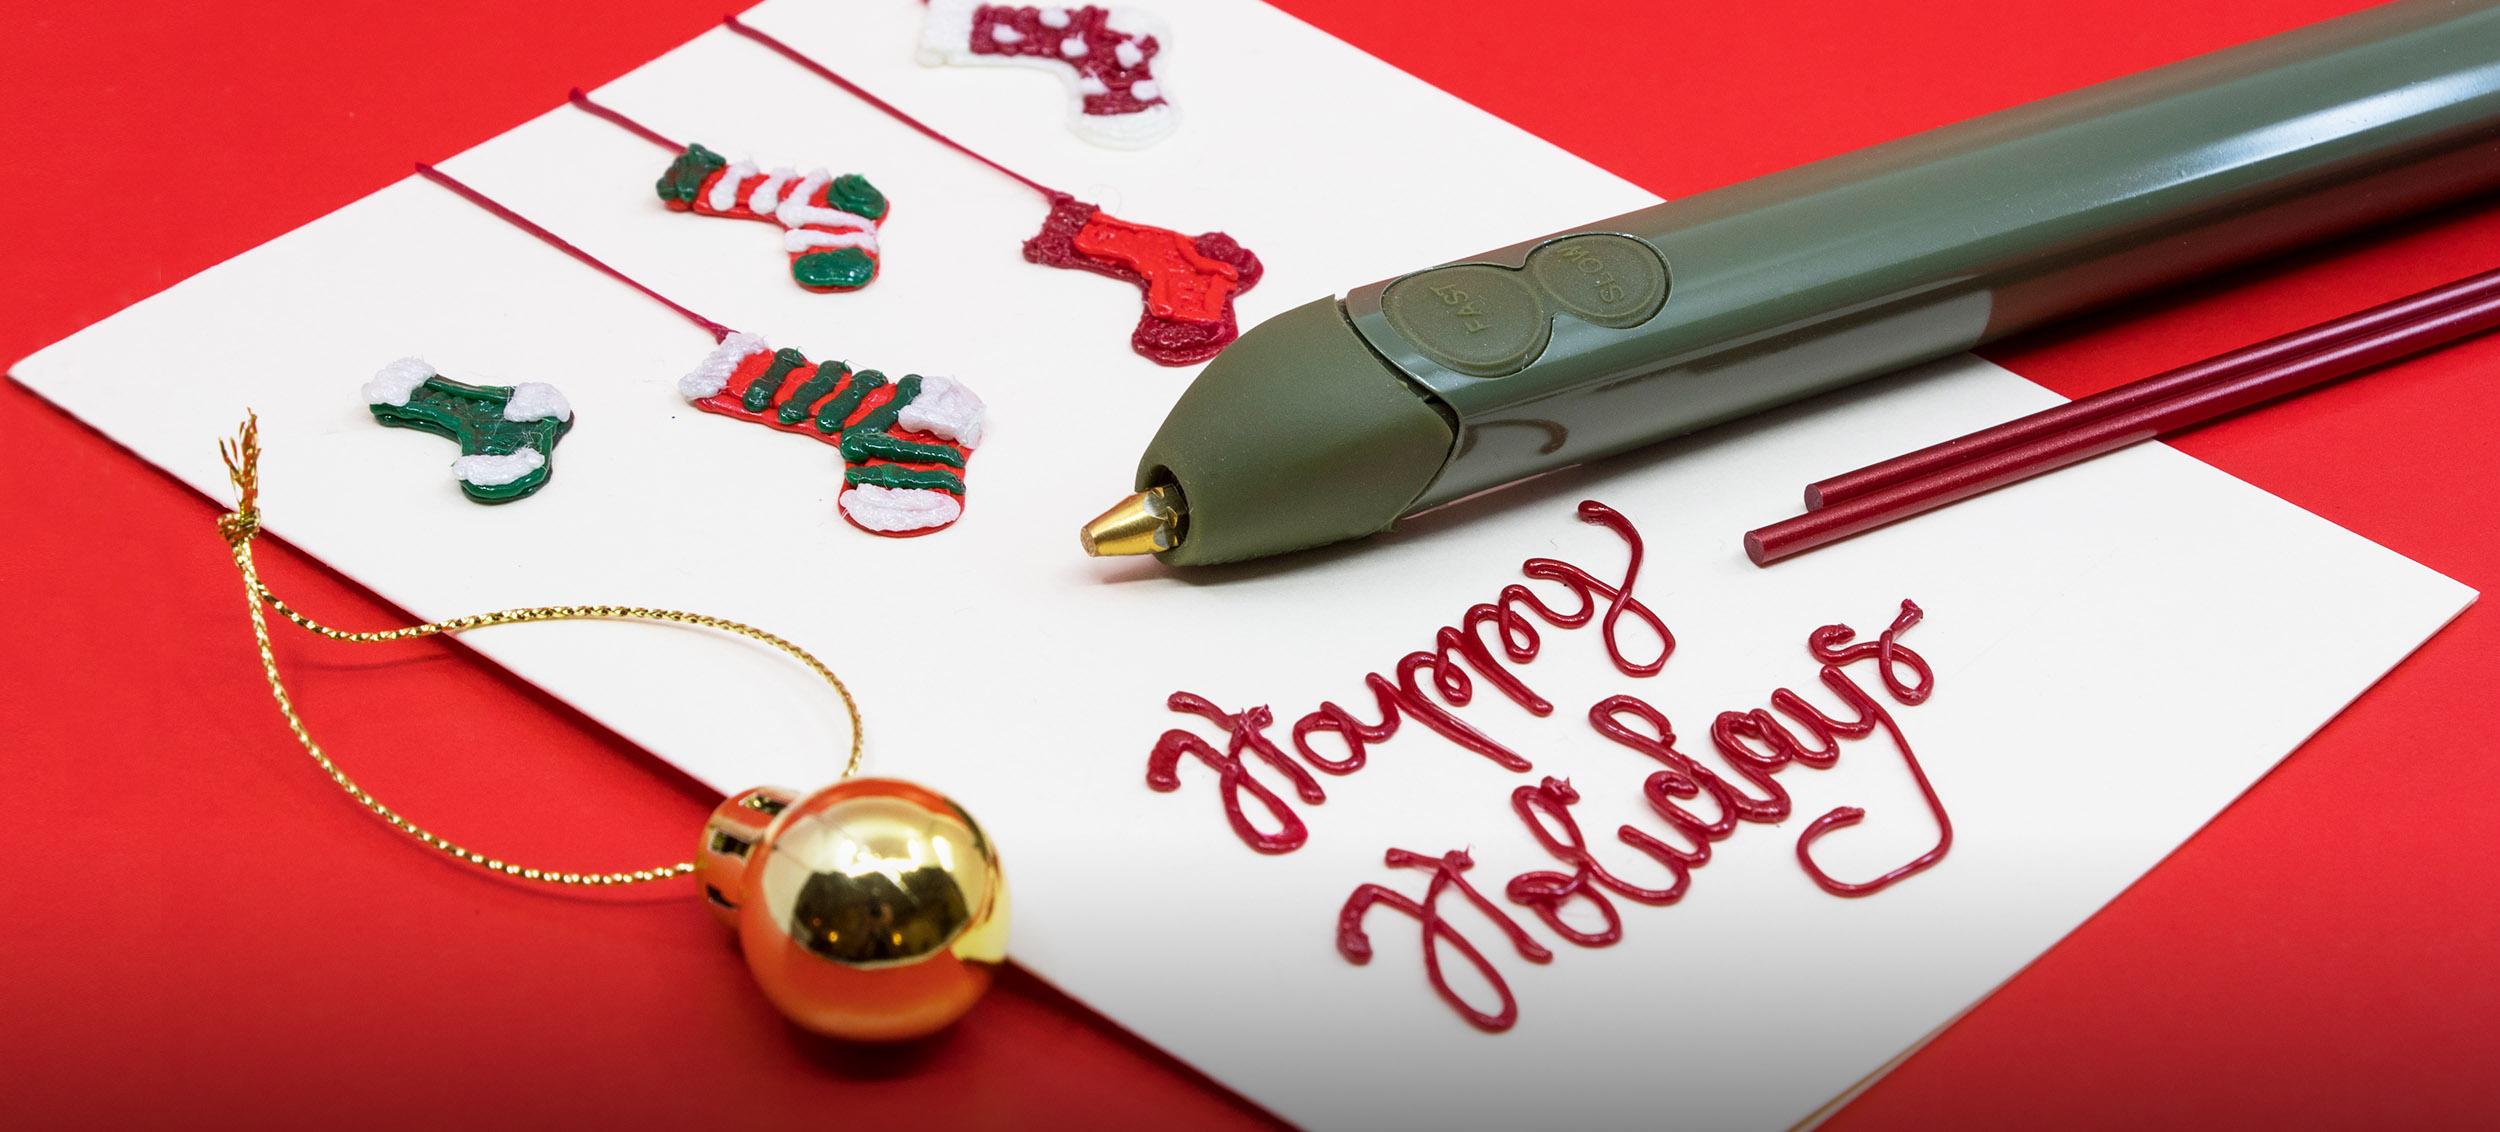 Handmade Christmas Cards Decor Ideas Made With A 3d Pen 3doodler